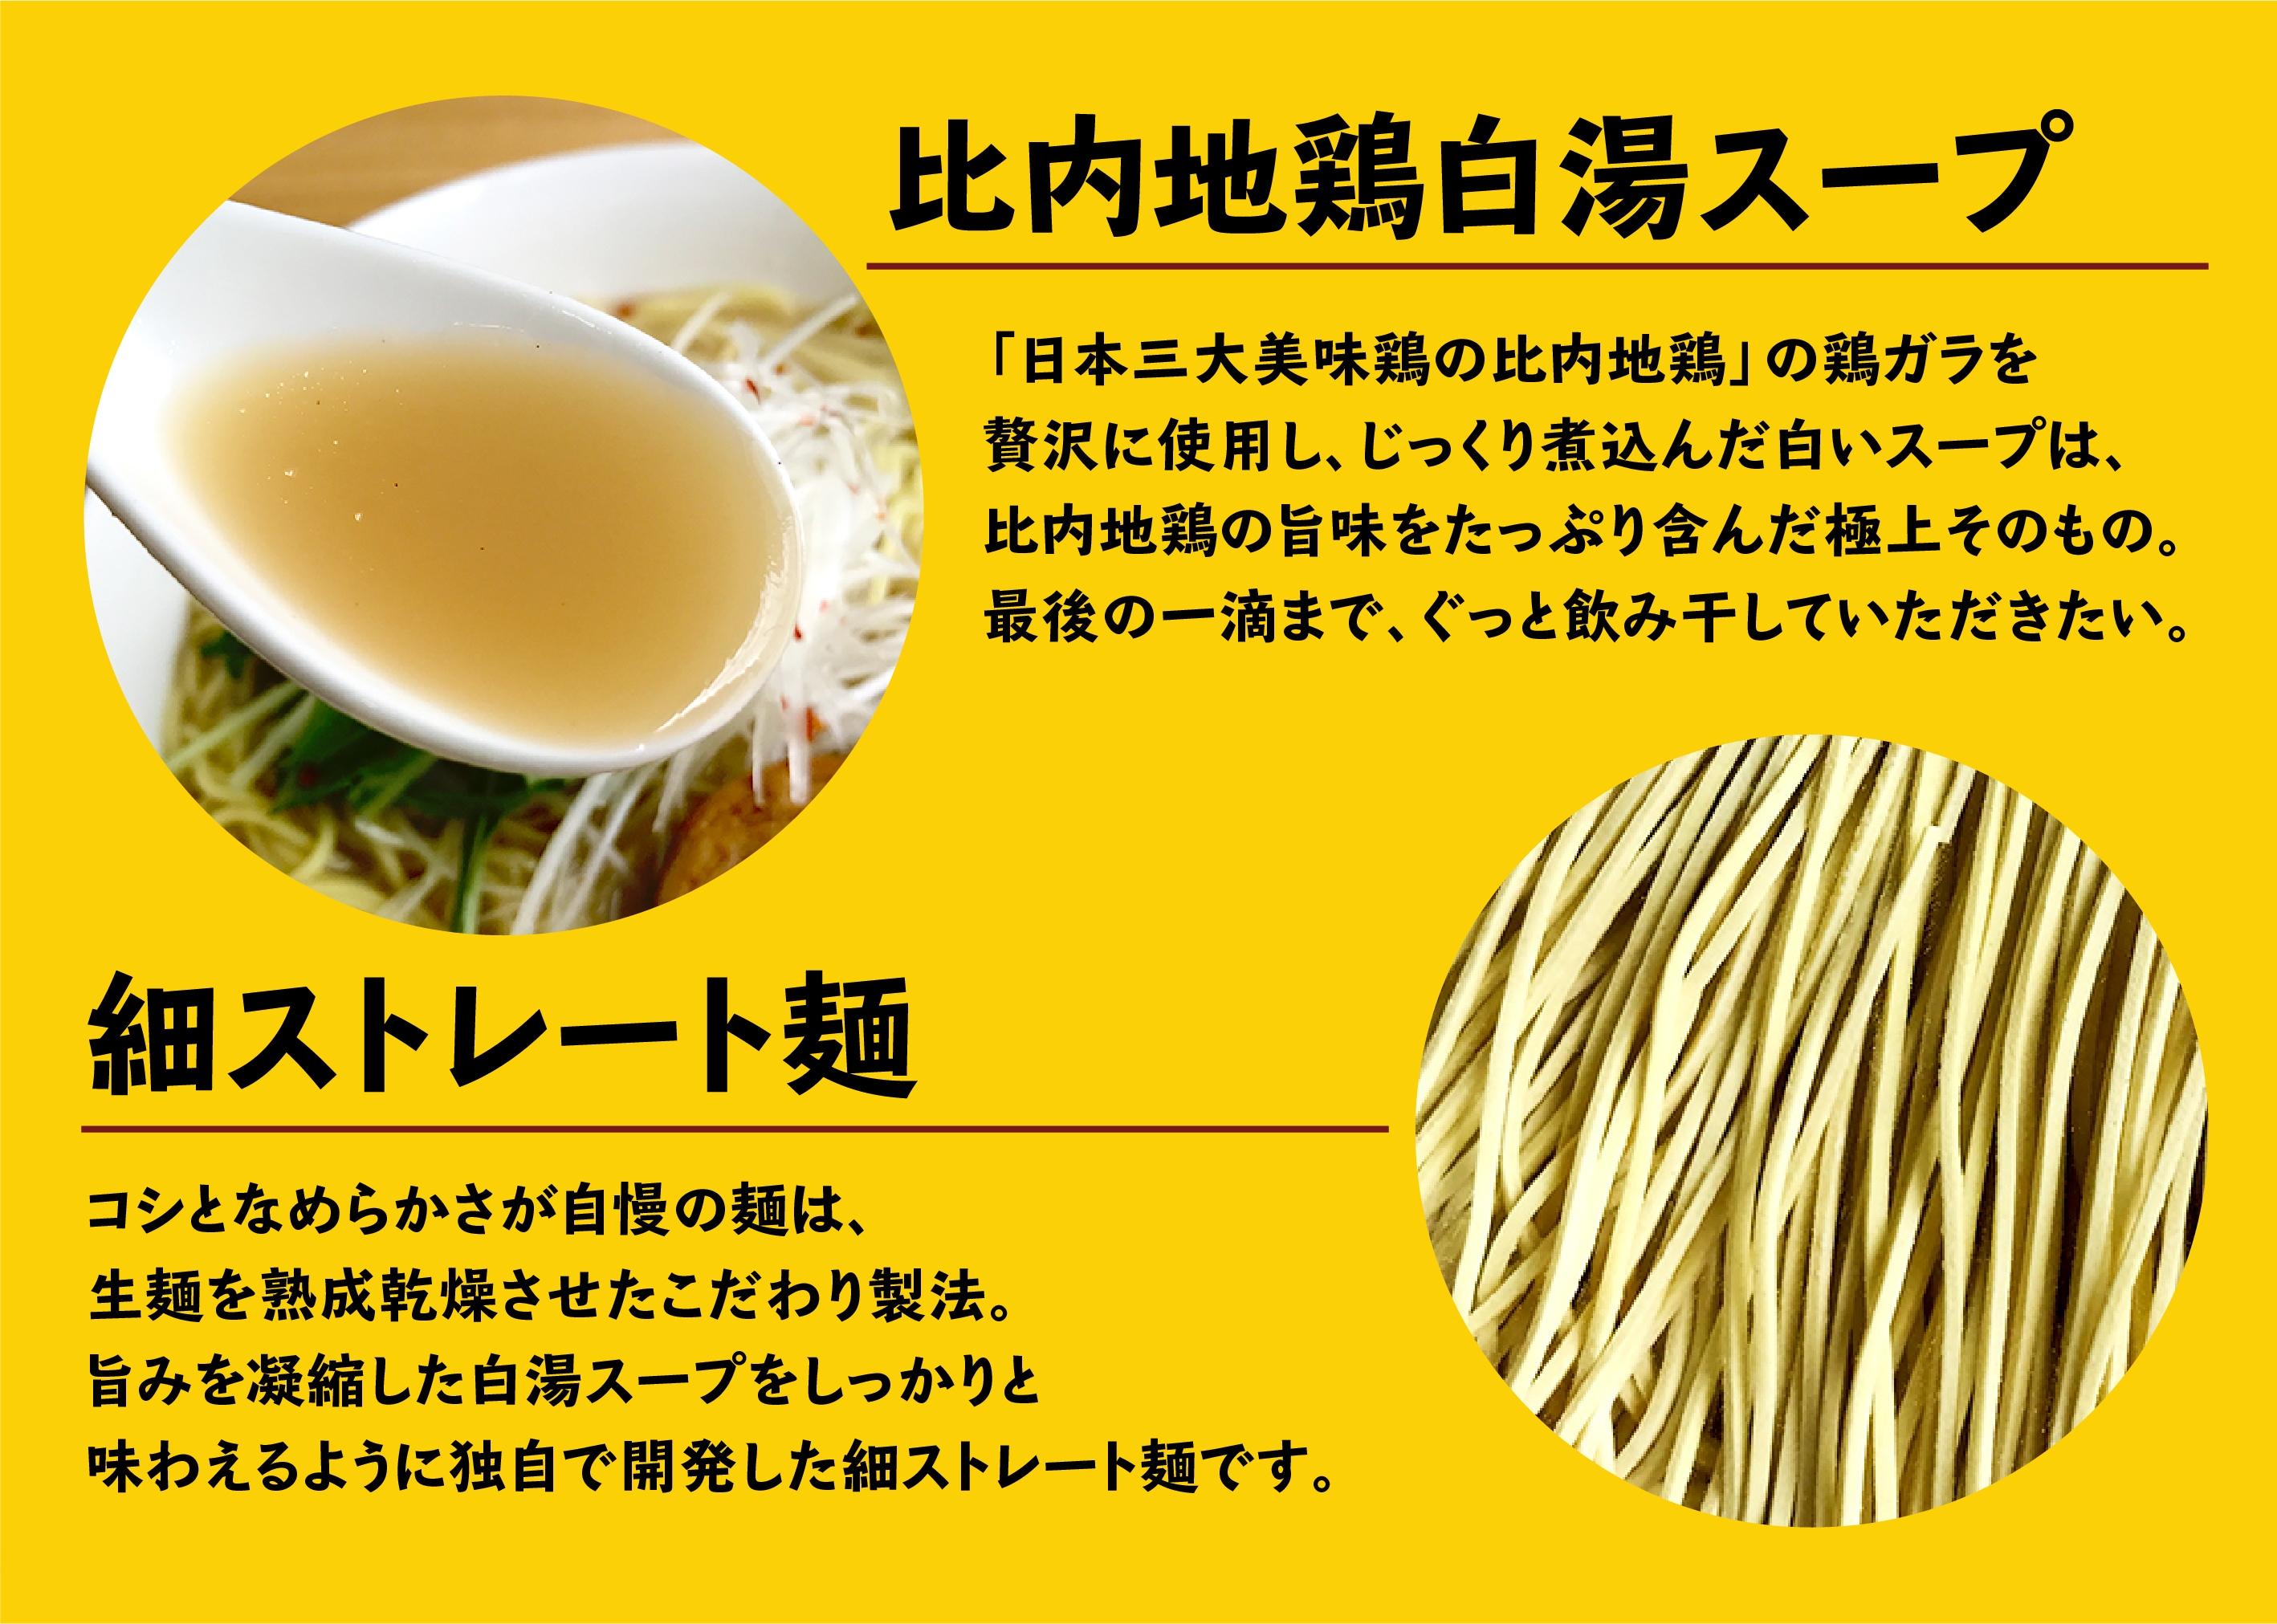 UMAMYラーメンのスープと麺